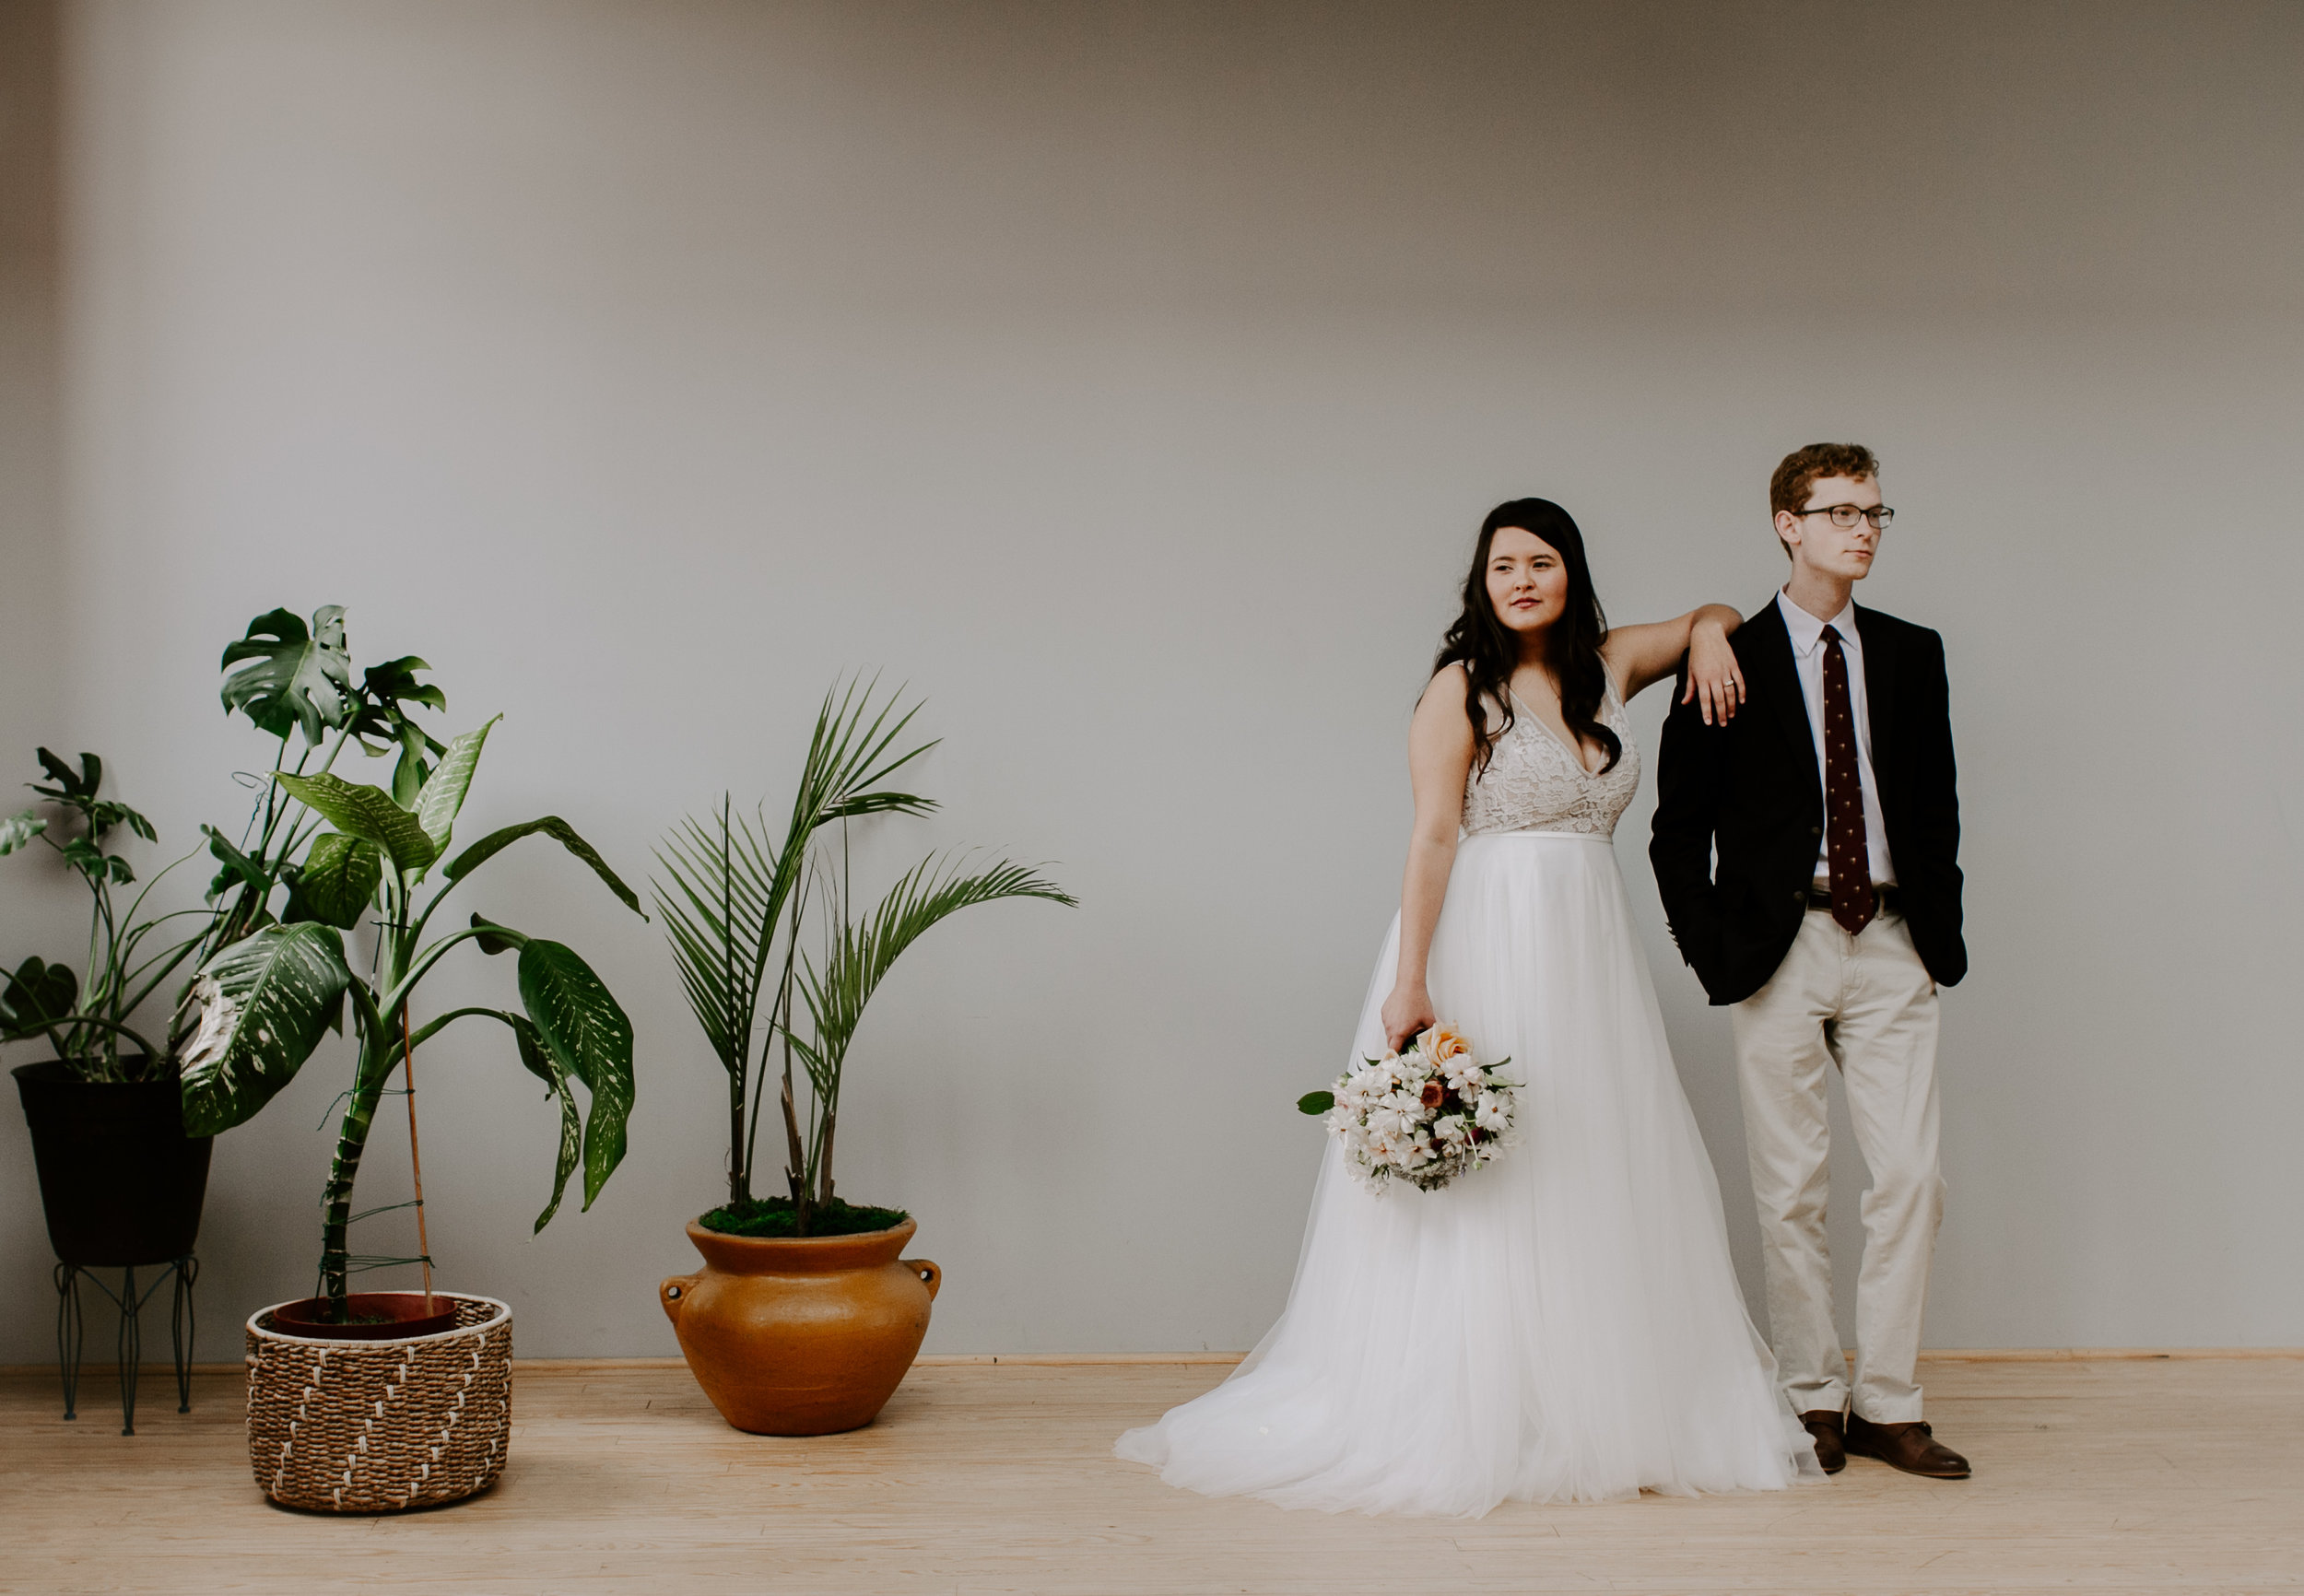 hollowayhousestyledwedding_oklahomamodernweddingphotographer-28.jpg